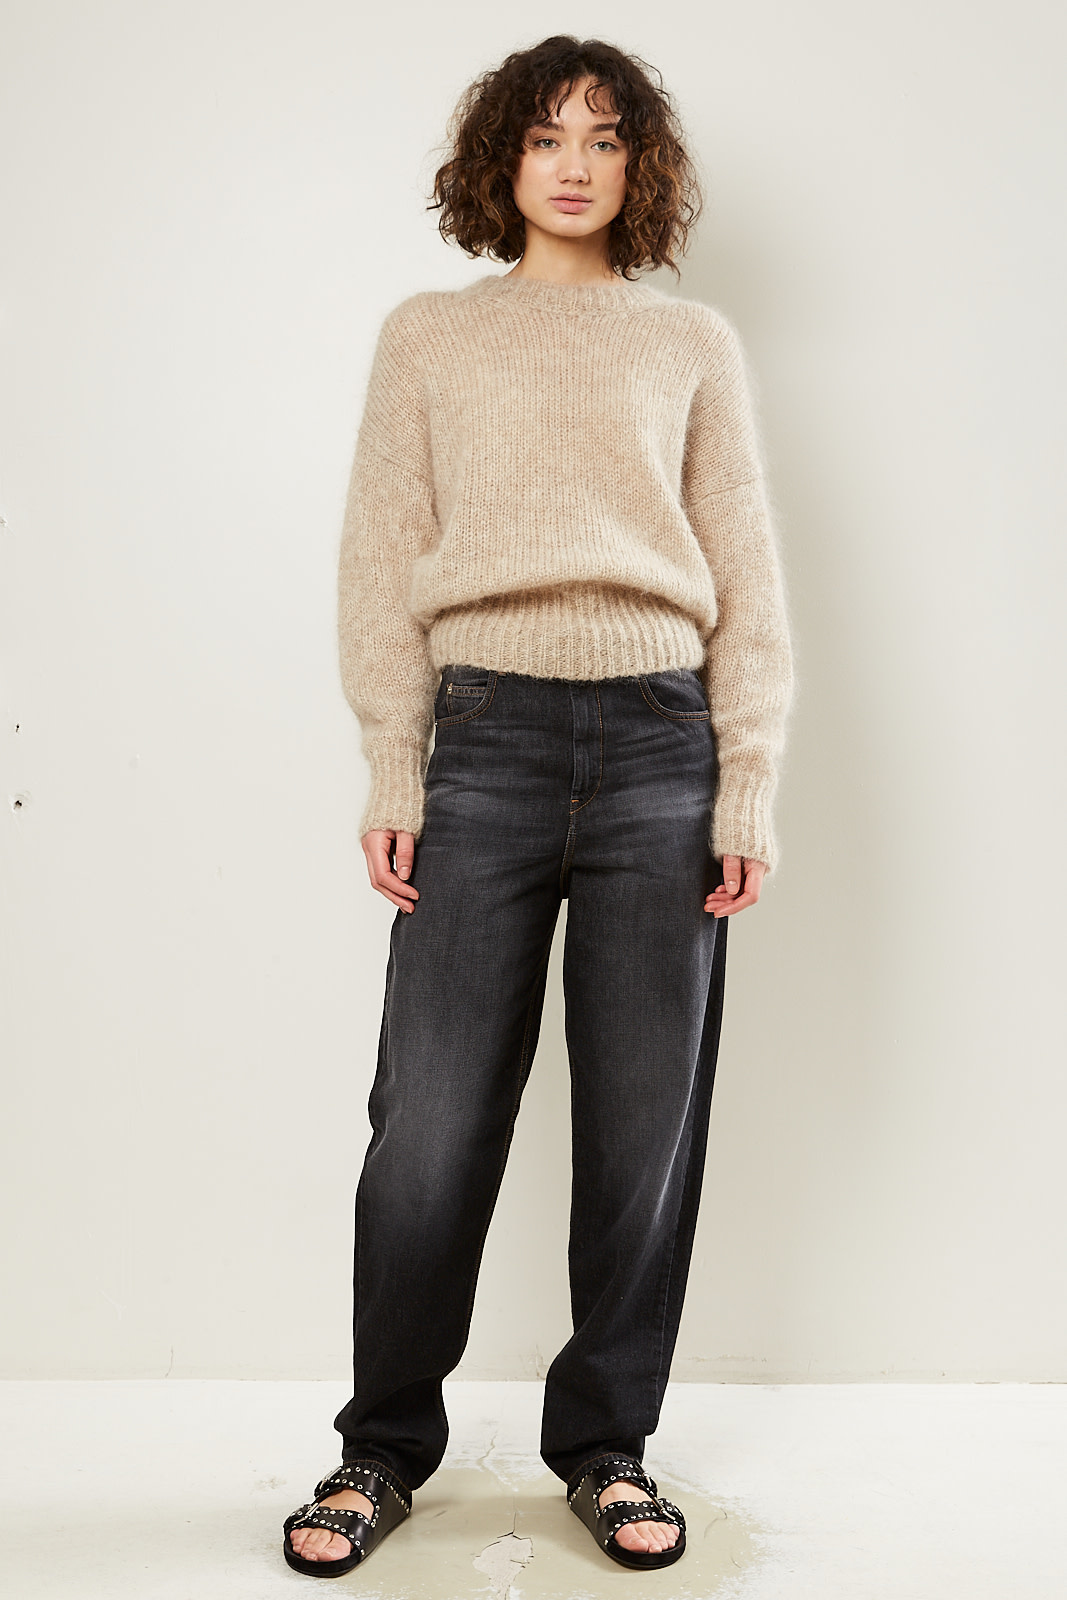 Isabel Marant - Estelle chunky light knit sweater